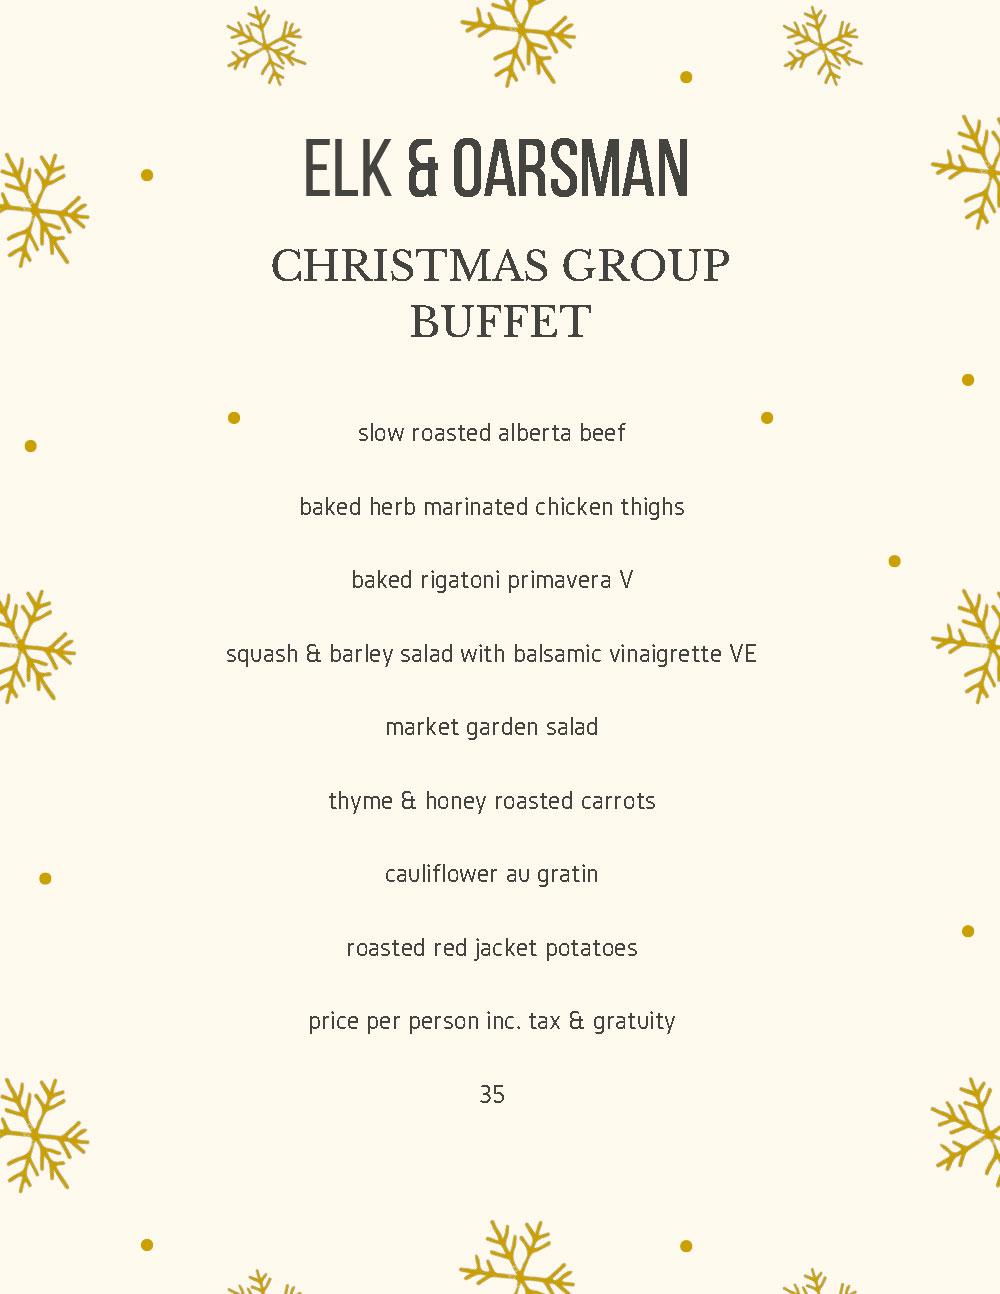 Elk & Oarsman Christmas Group Buffet Menu